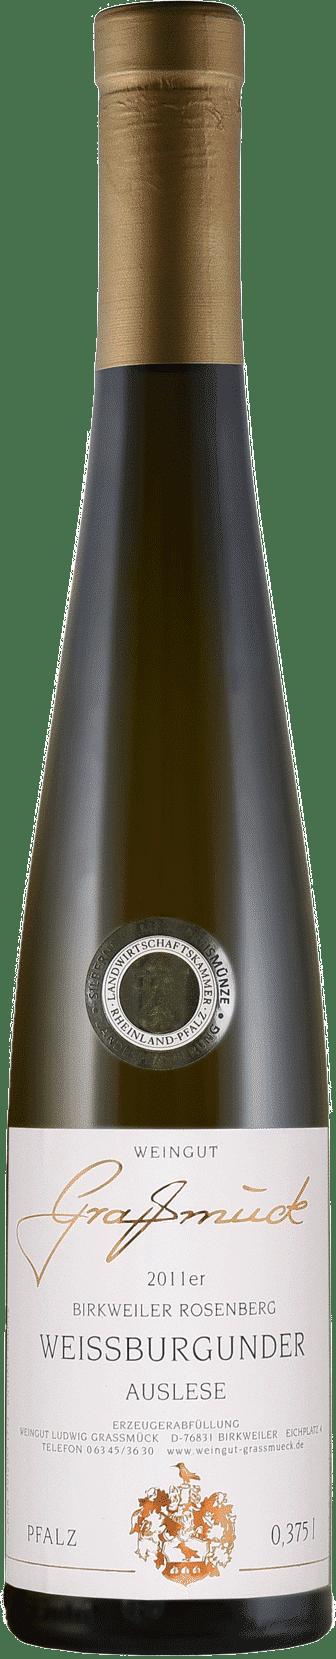 Weingut Ludwig Graßmück, Simon Graßmück, Weissburgunder Auslese